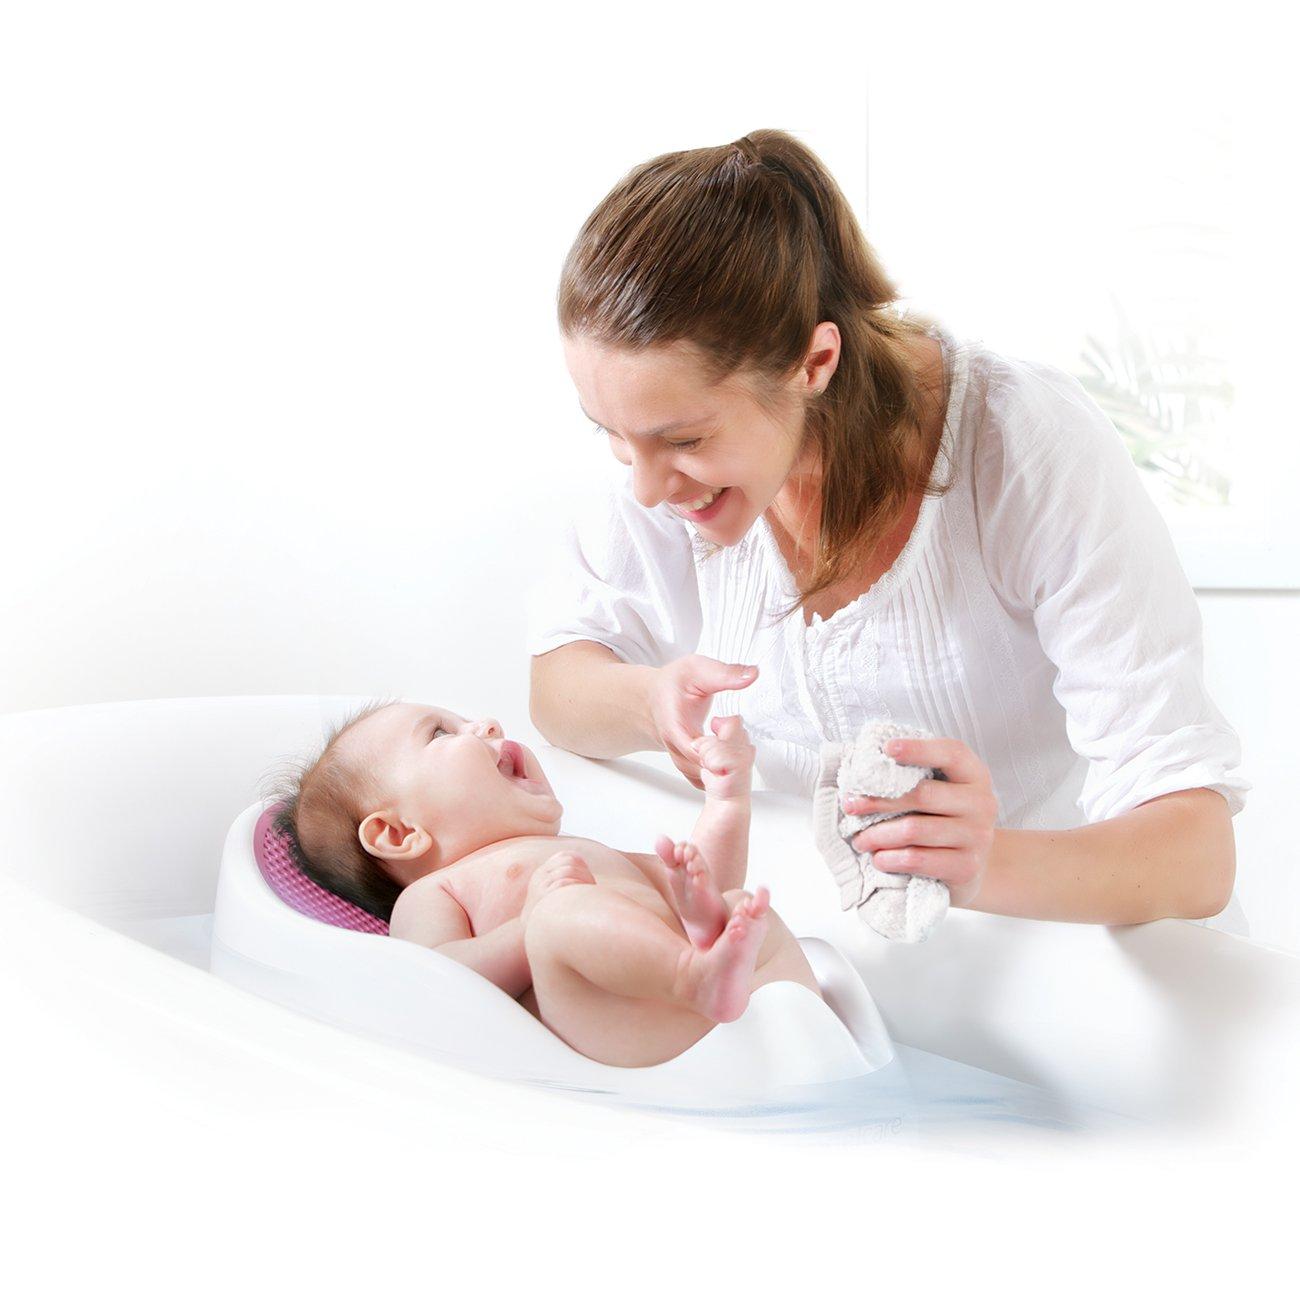 Vaschetta neonato - Riduttore vasca bagno bambino ...